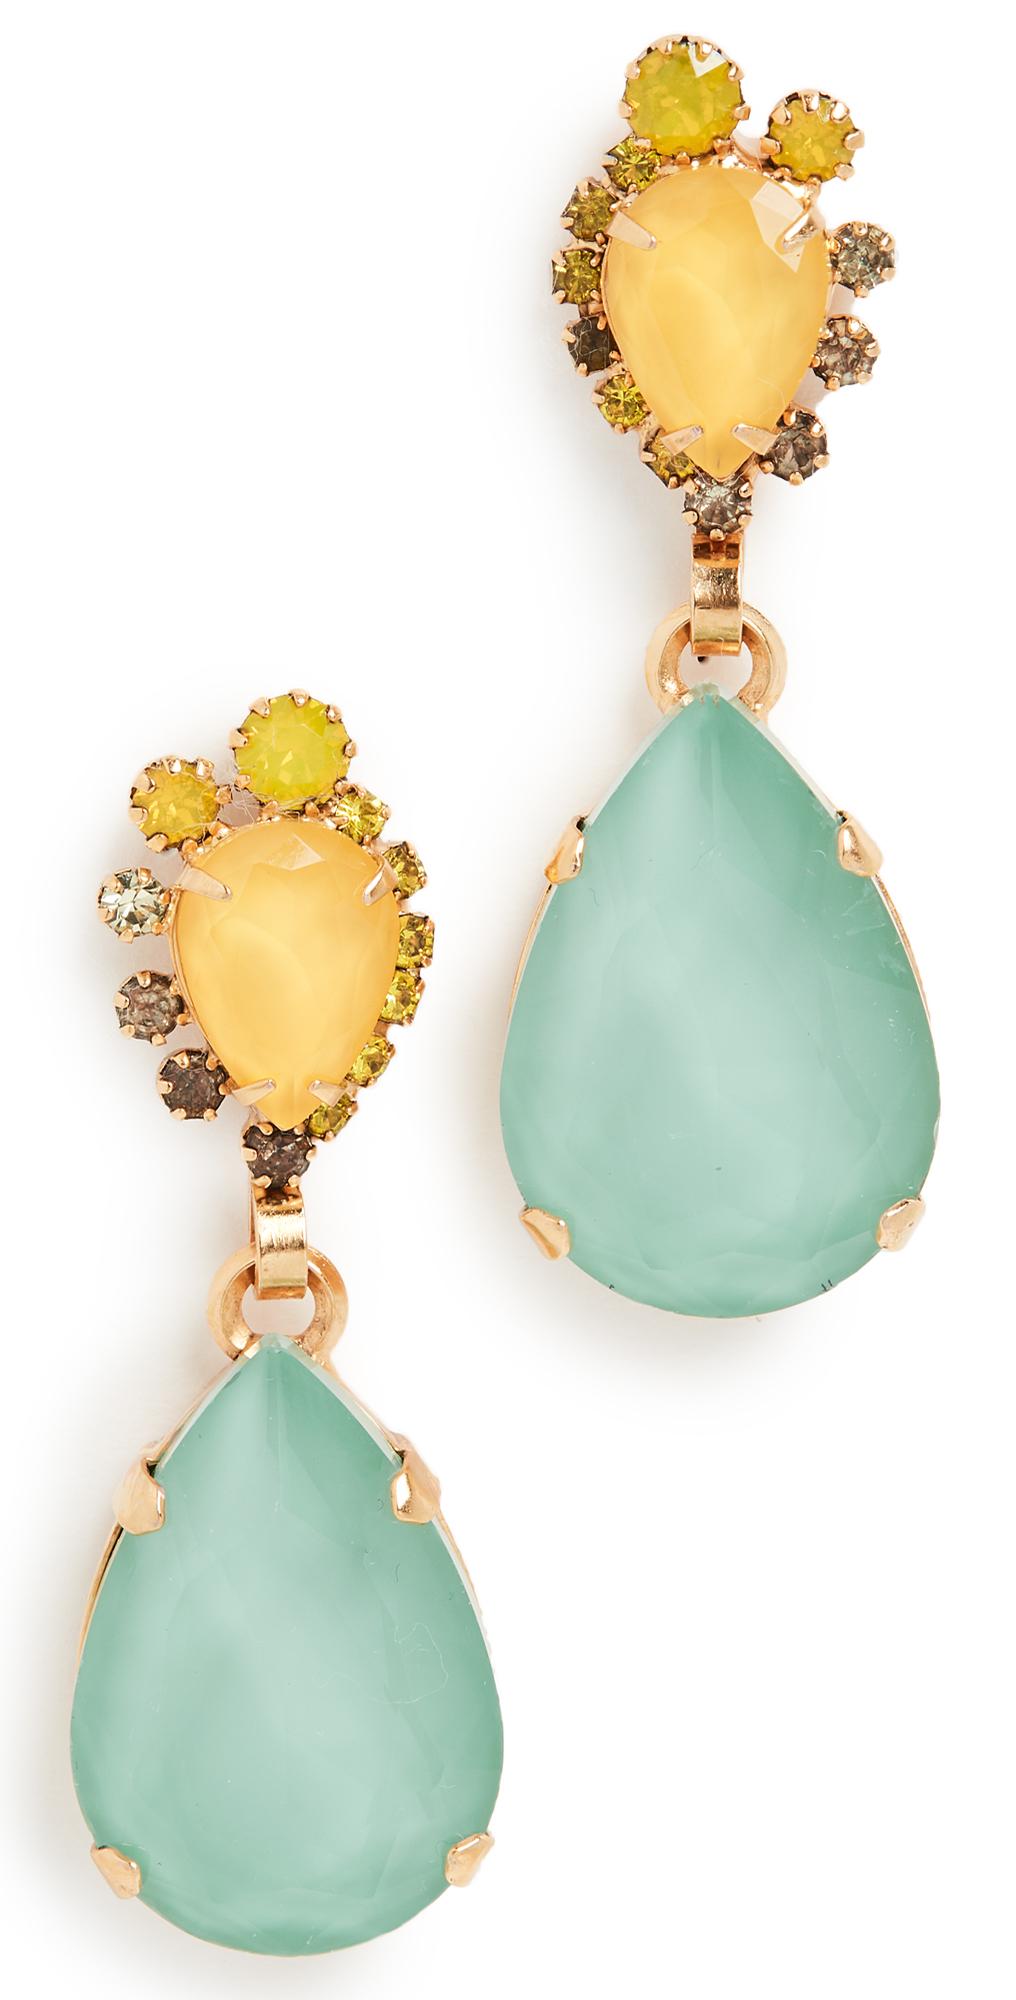 Gaelle Earrings